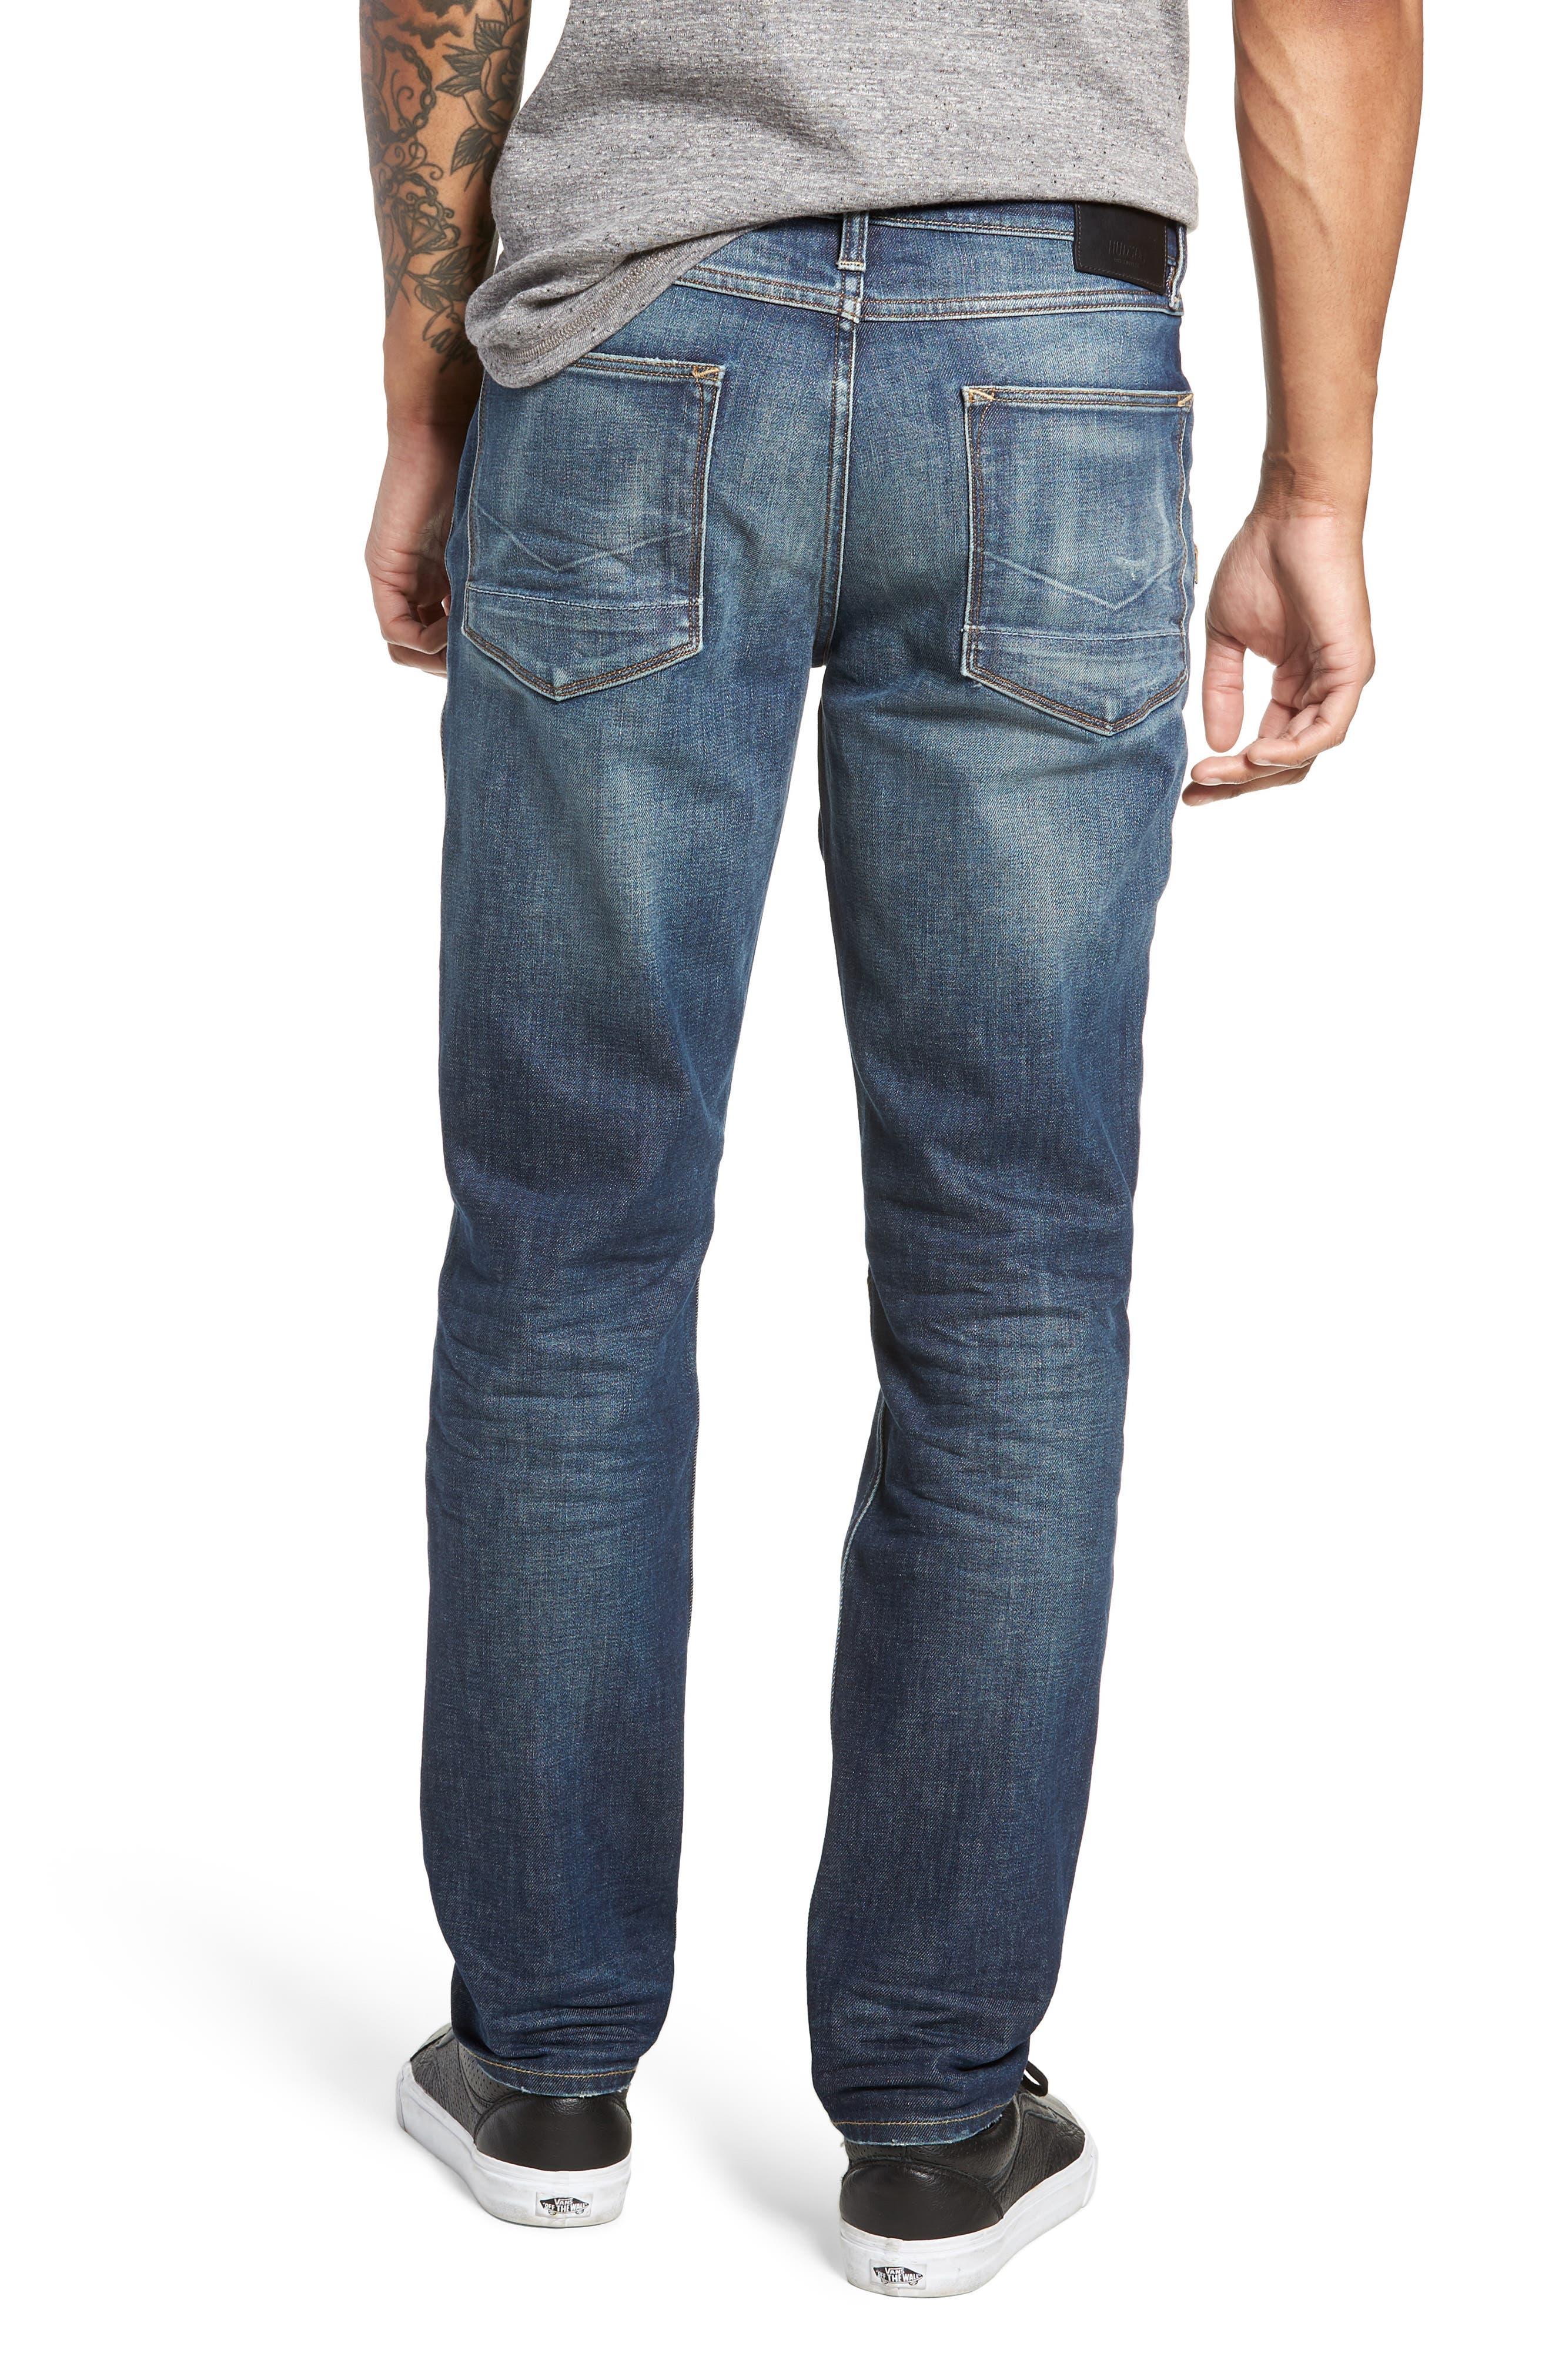 da11bfda4beee9 All Men s Hudson Jeans  Sale